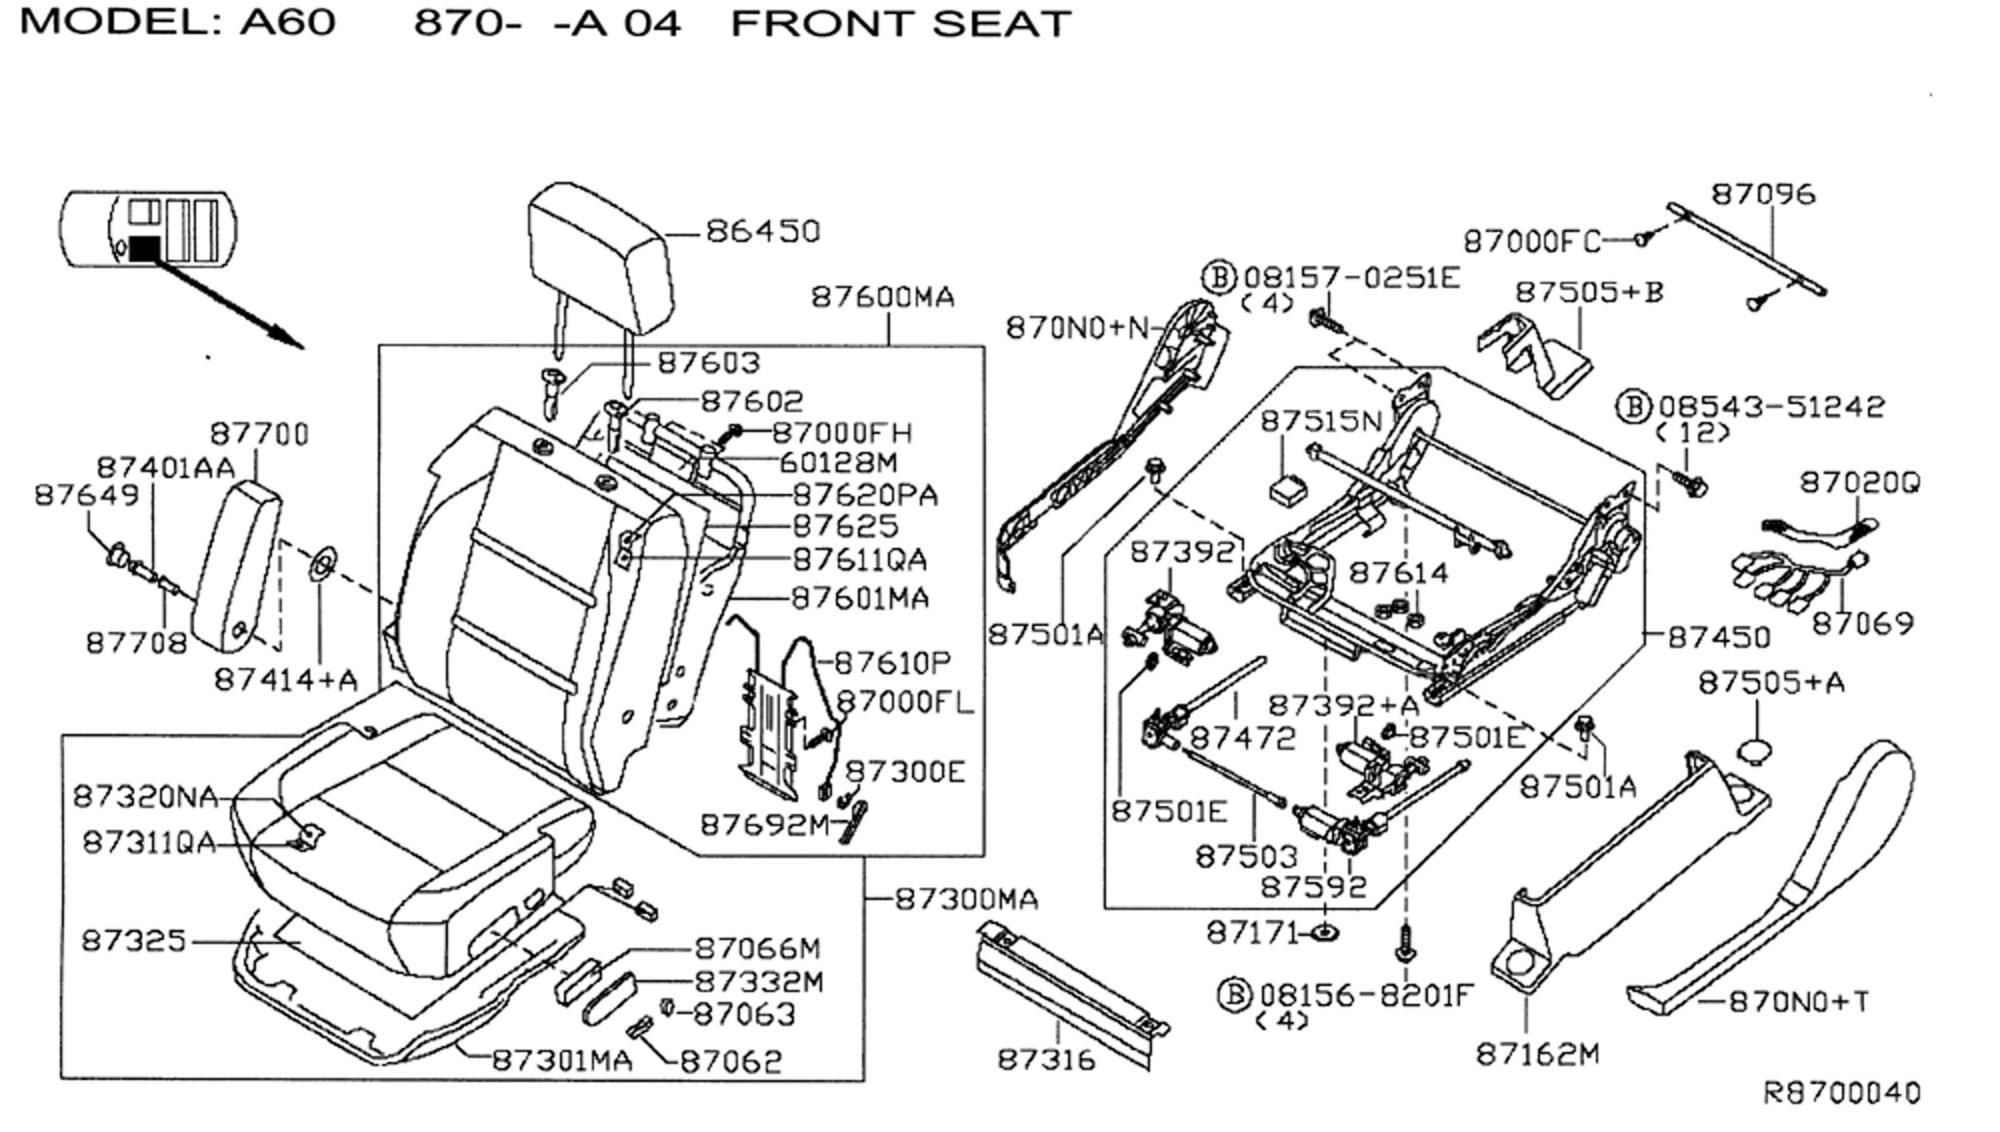 hight resolution of nissan seat diagram wiring diagram centre drivers side seat cushion nissan titan forumtruck seat cushion2 jpg